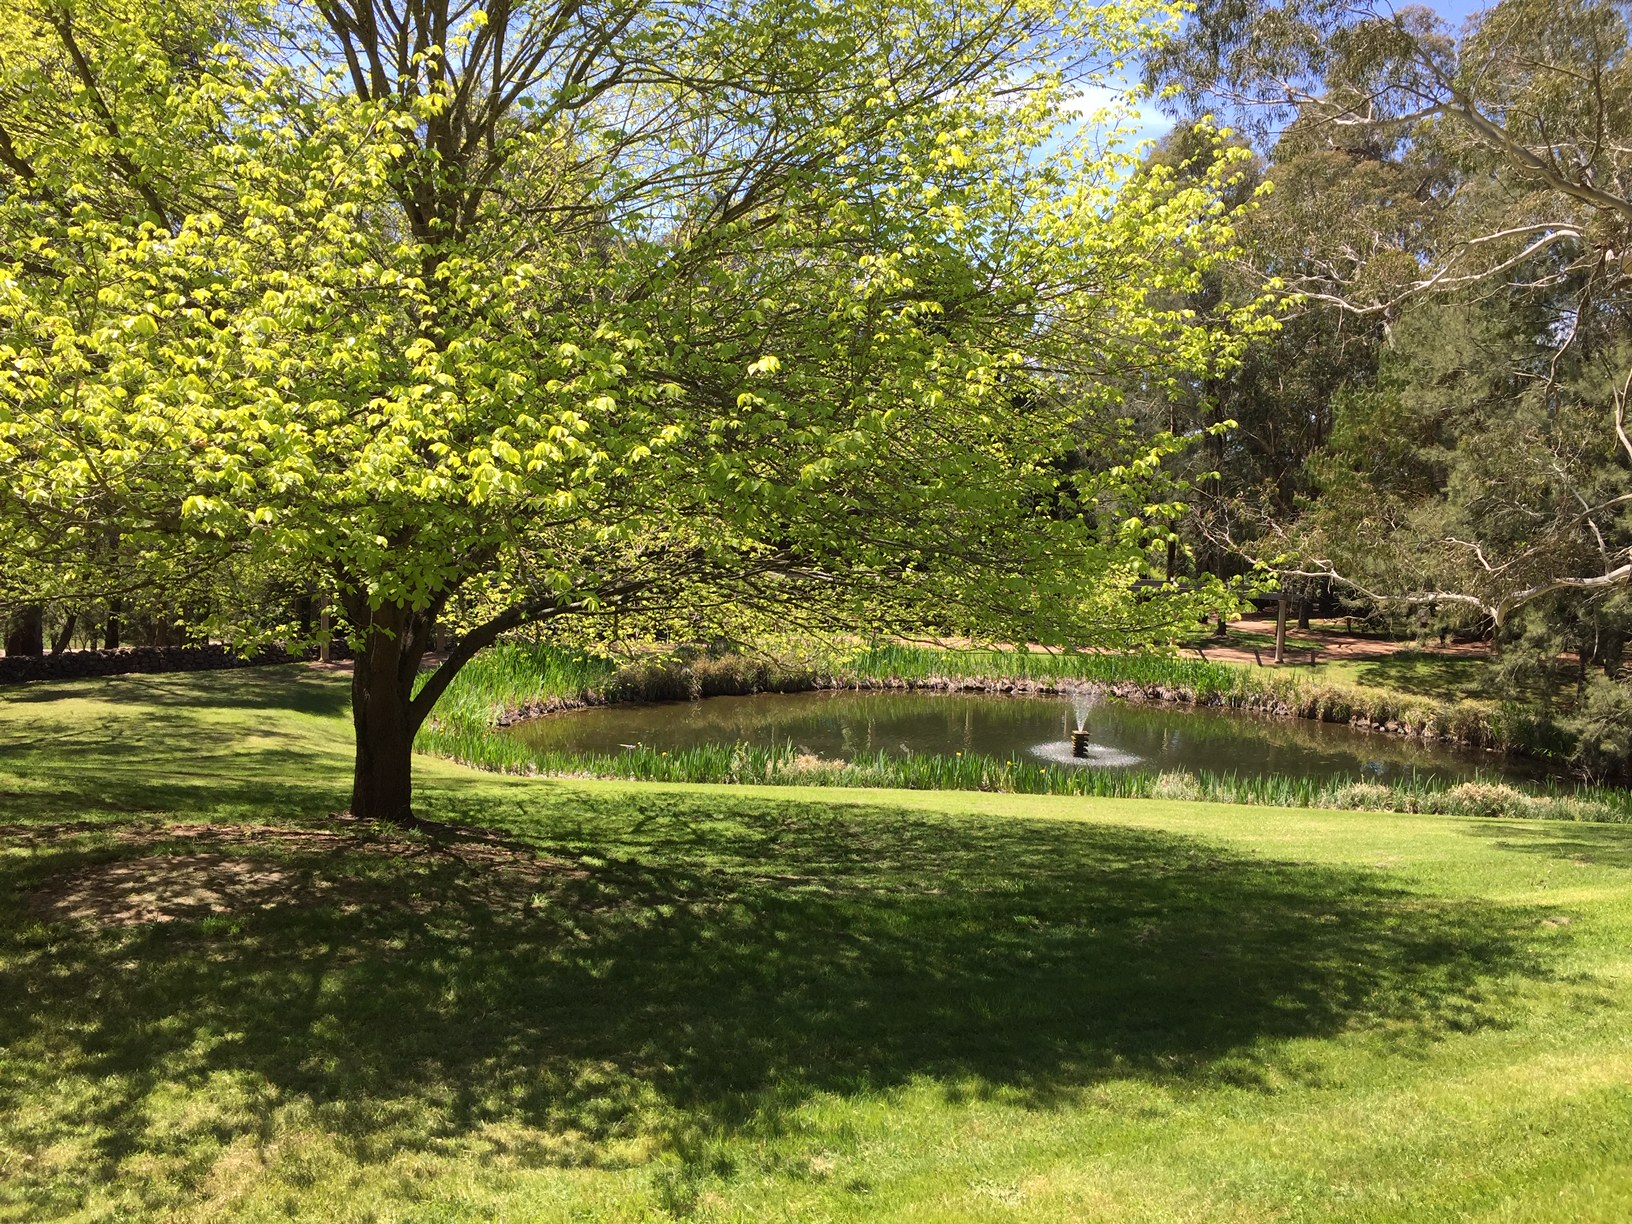 Newly-established garden 'Greenbrier Park' at Mittagong